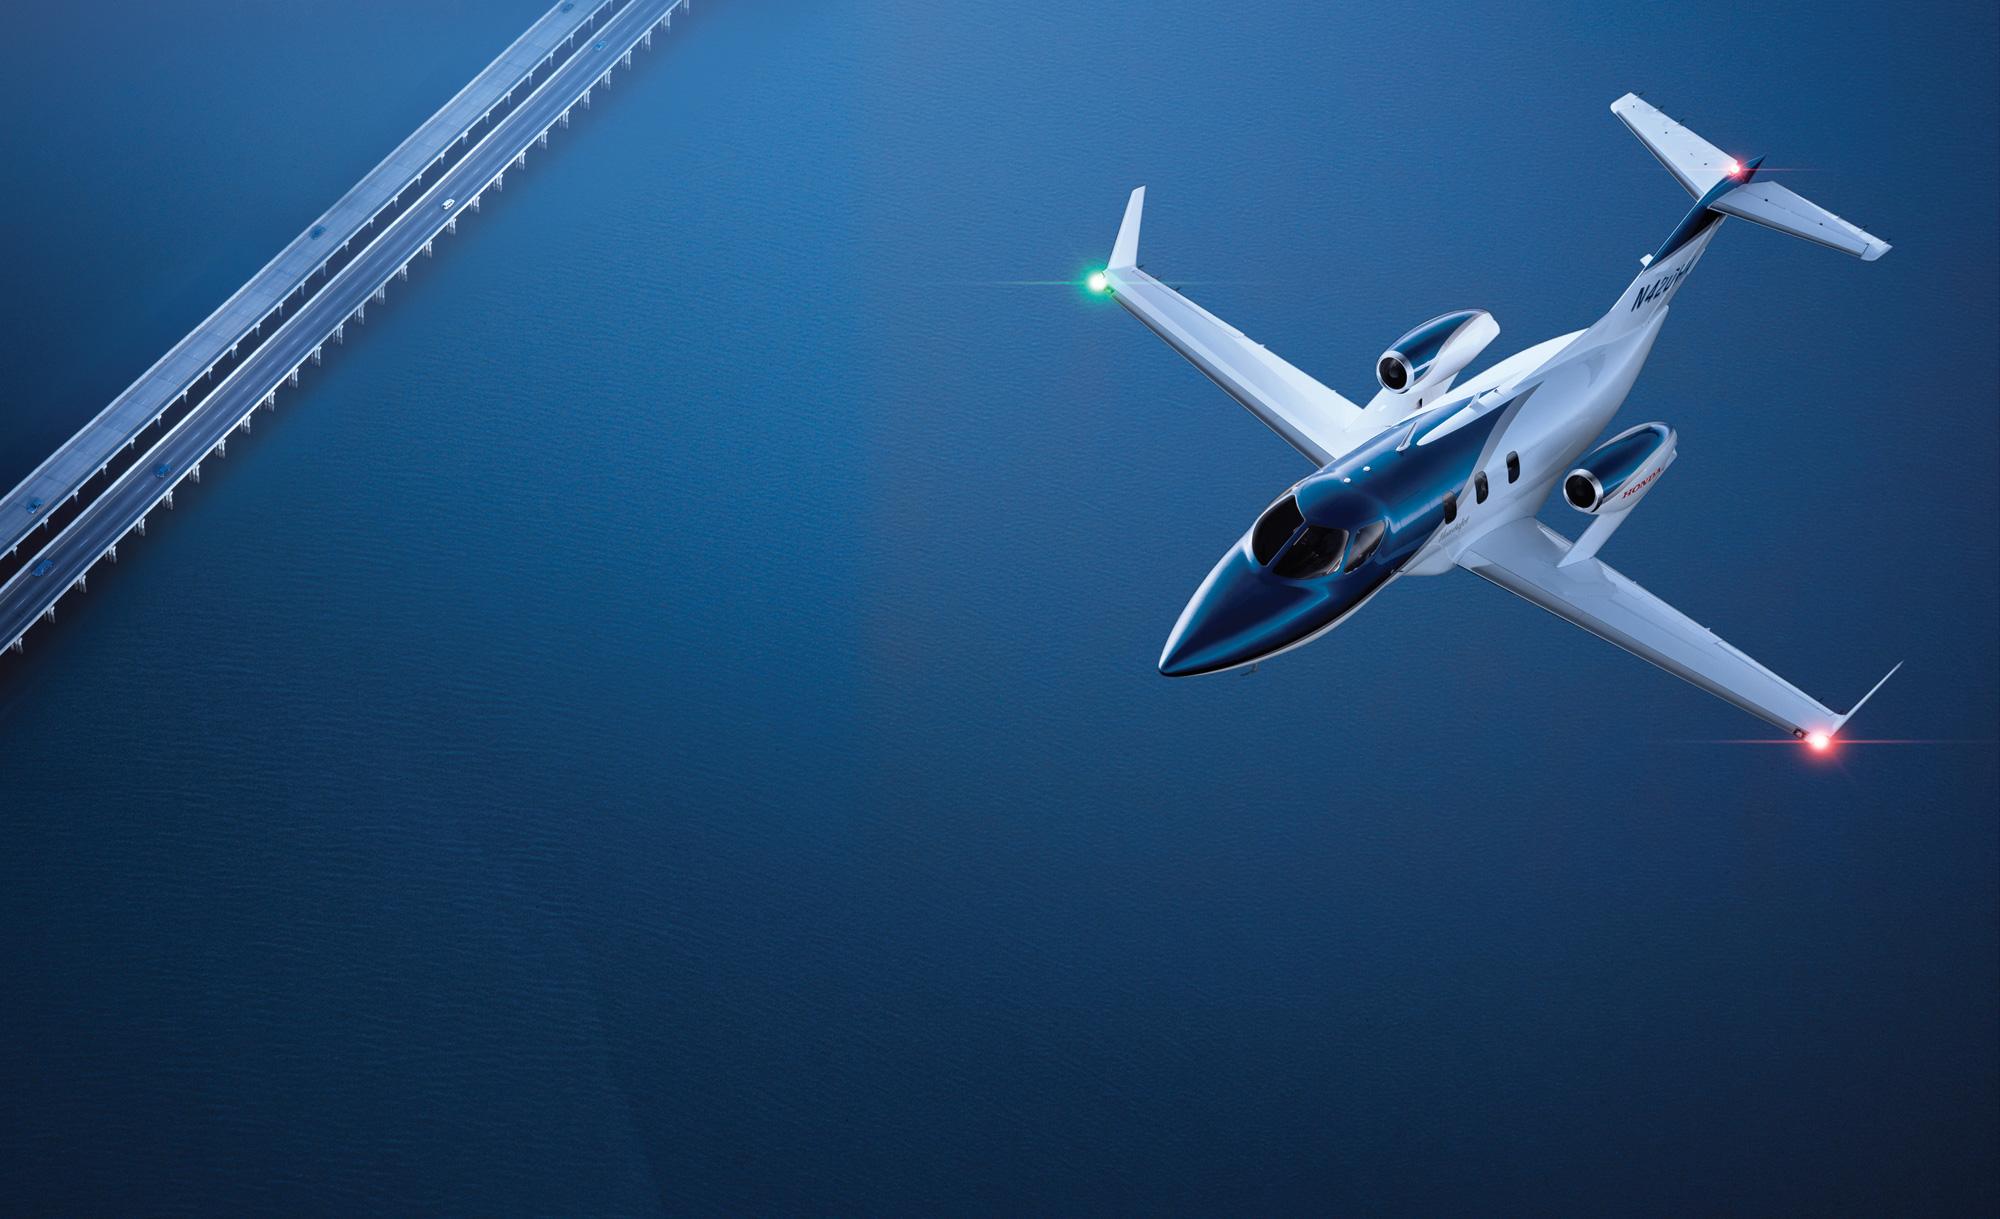 hondajet honda 39 s first light business jet moving closer